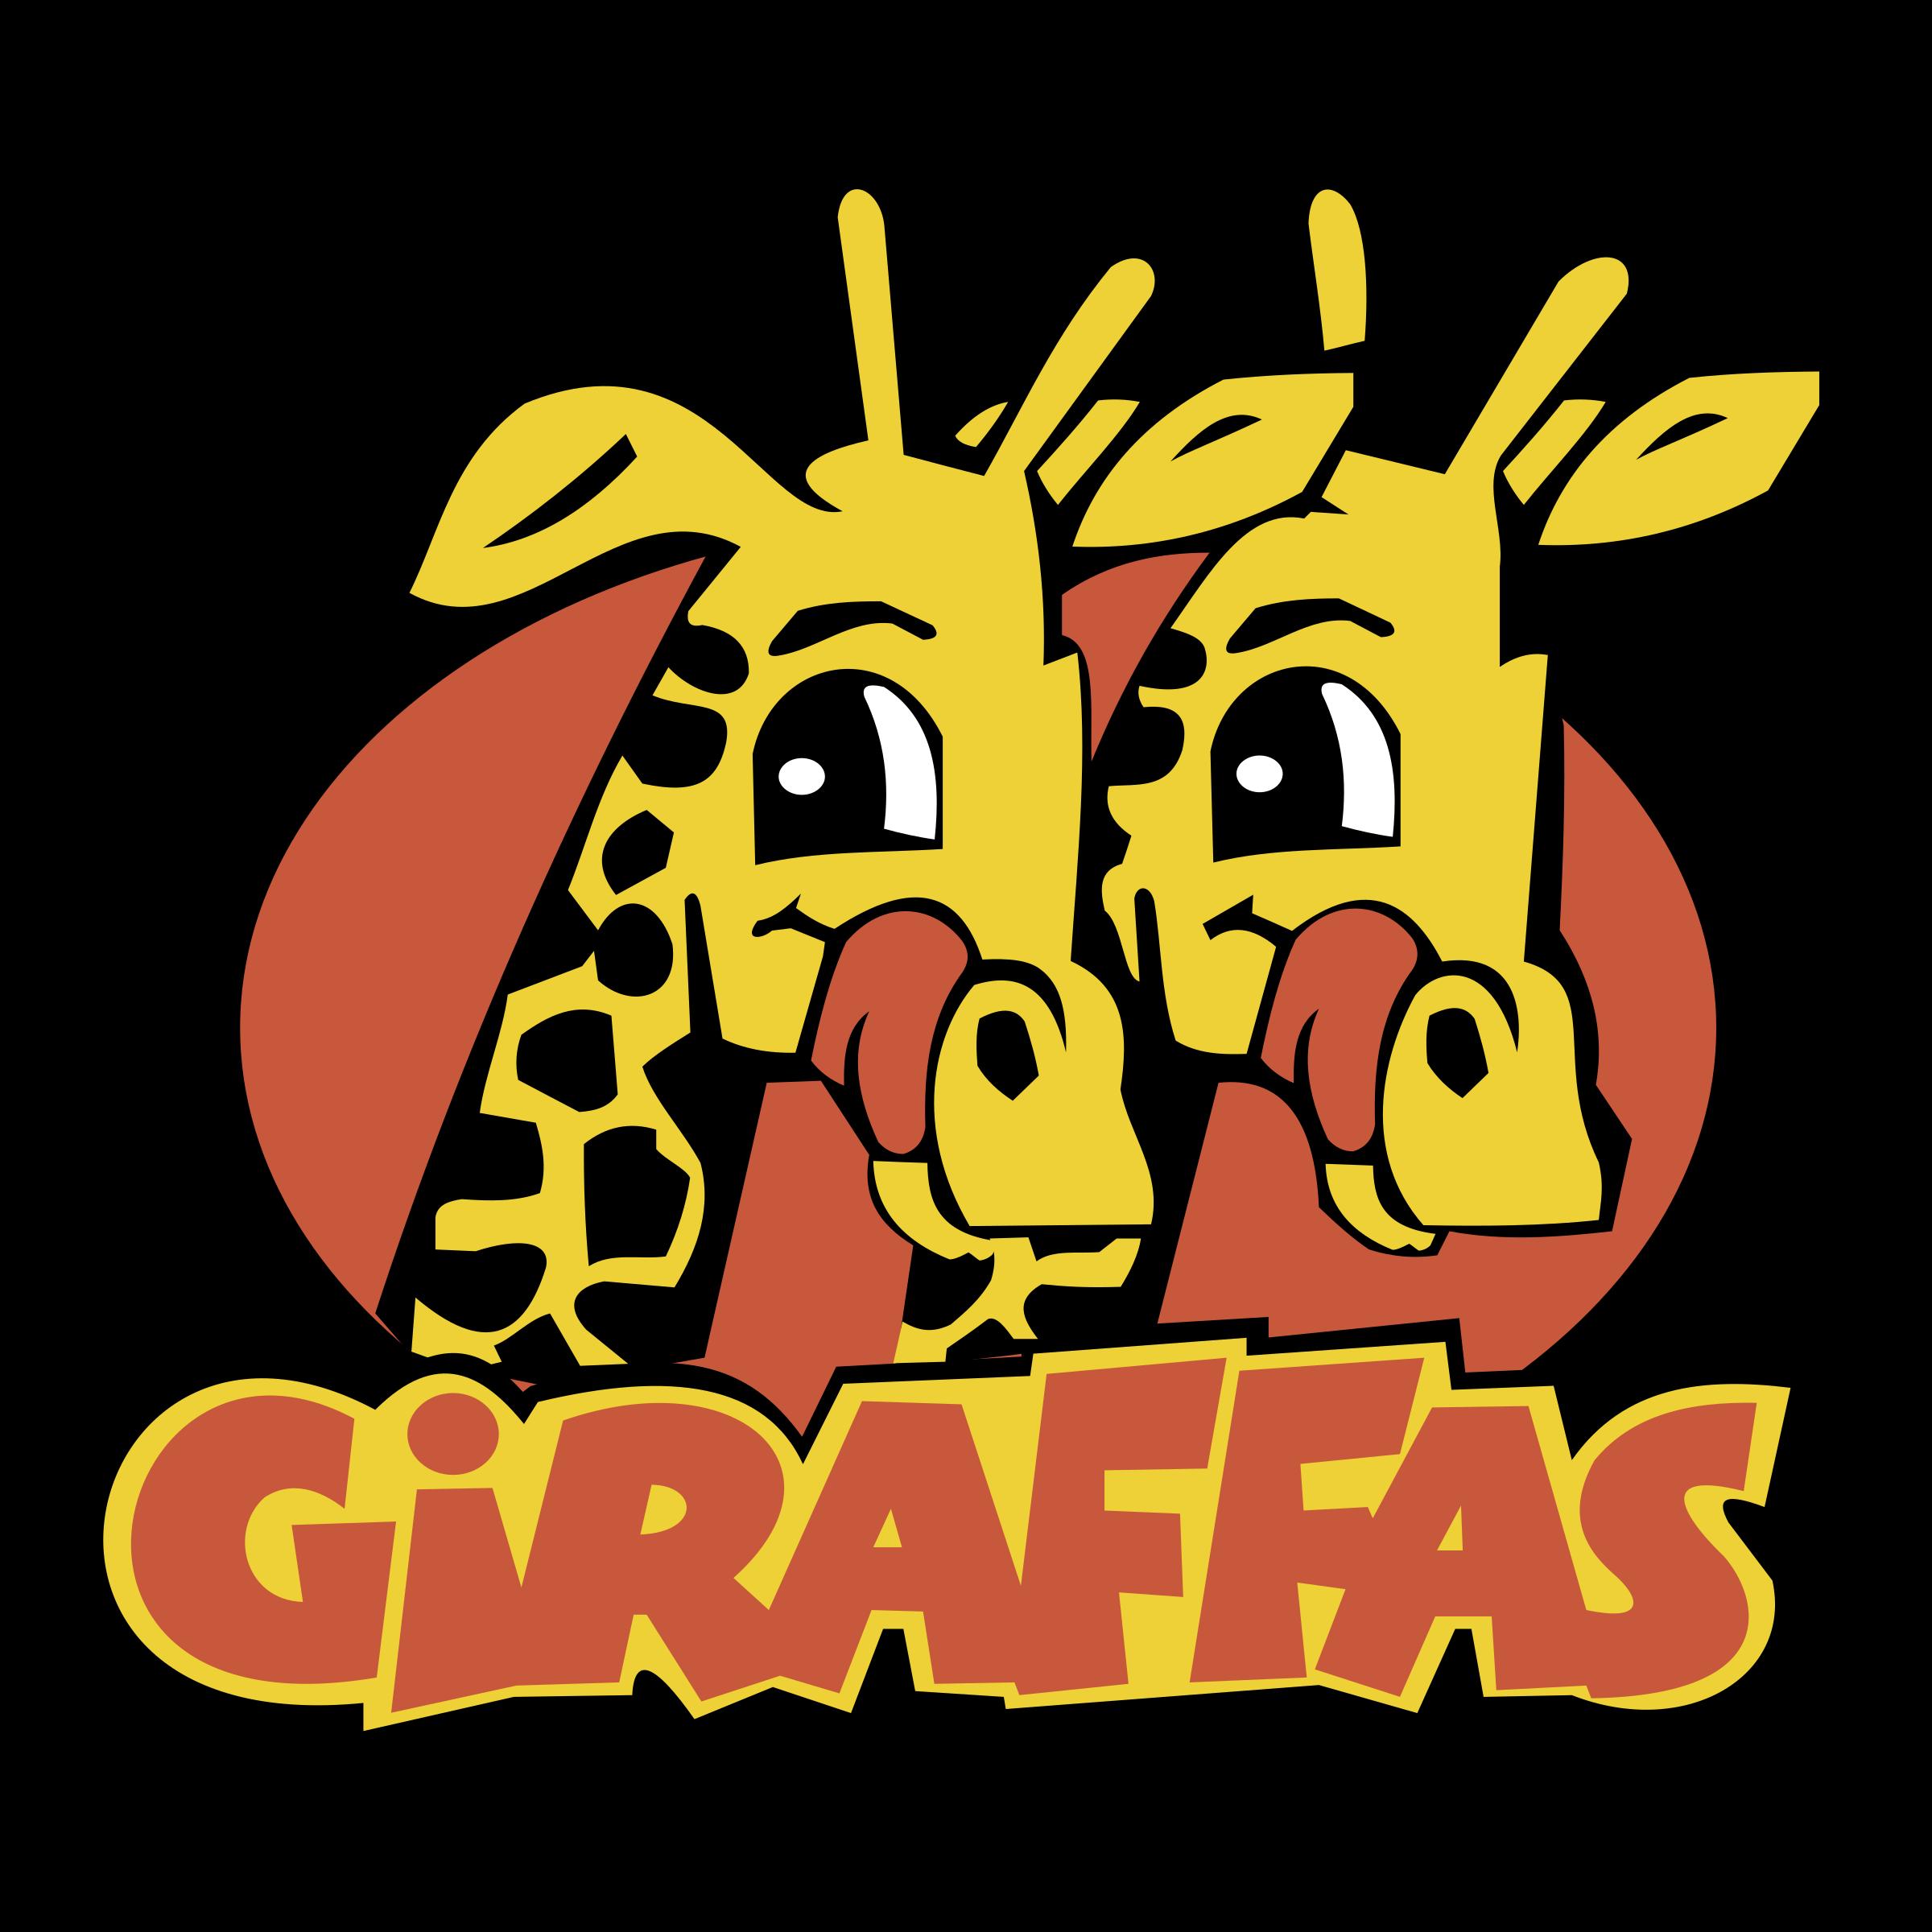 Giraffas Logo PNG Transparent & SVG Vector.